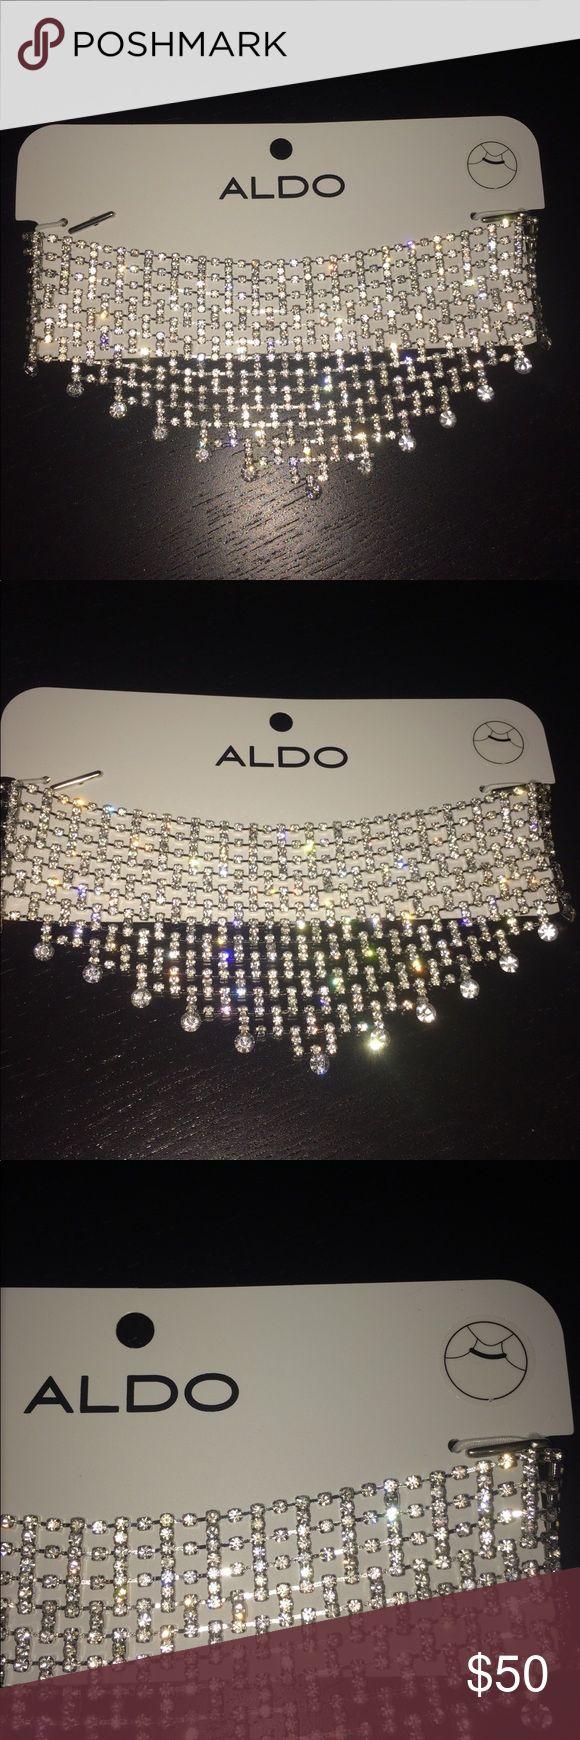 Aldo diamond choker Brand new diamond Aldo choker Aldo Jewelry Necklaces